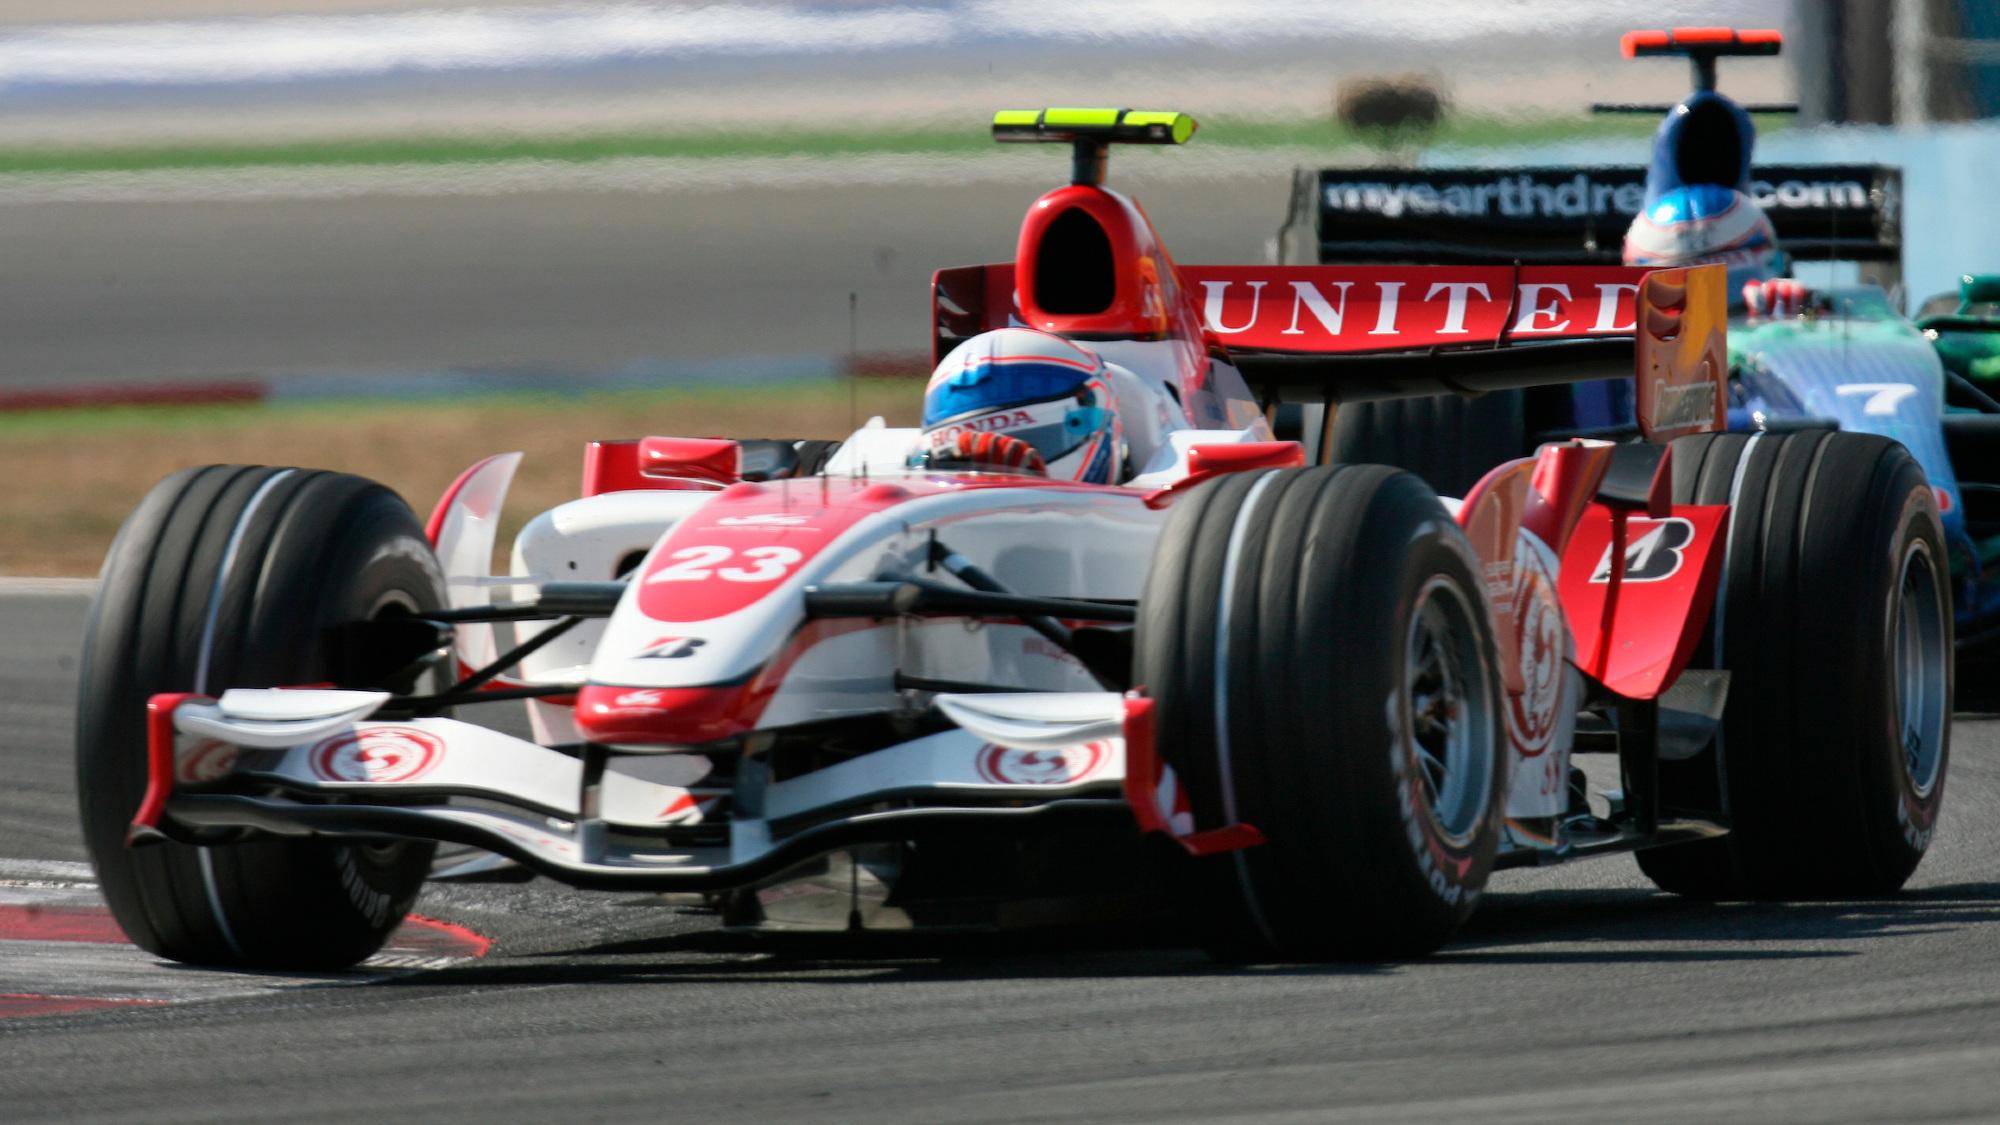 Anthony Davidson, 2007 Turkish GP